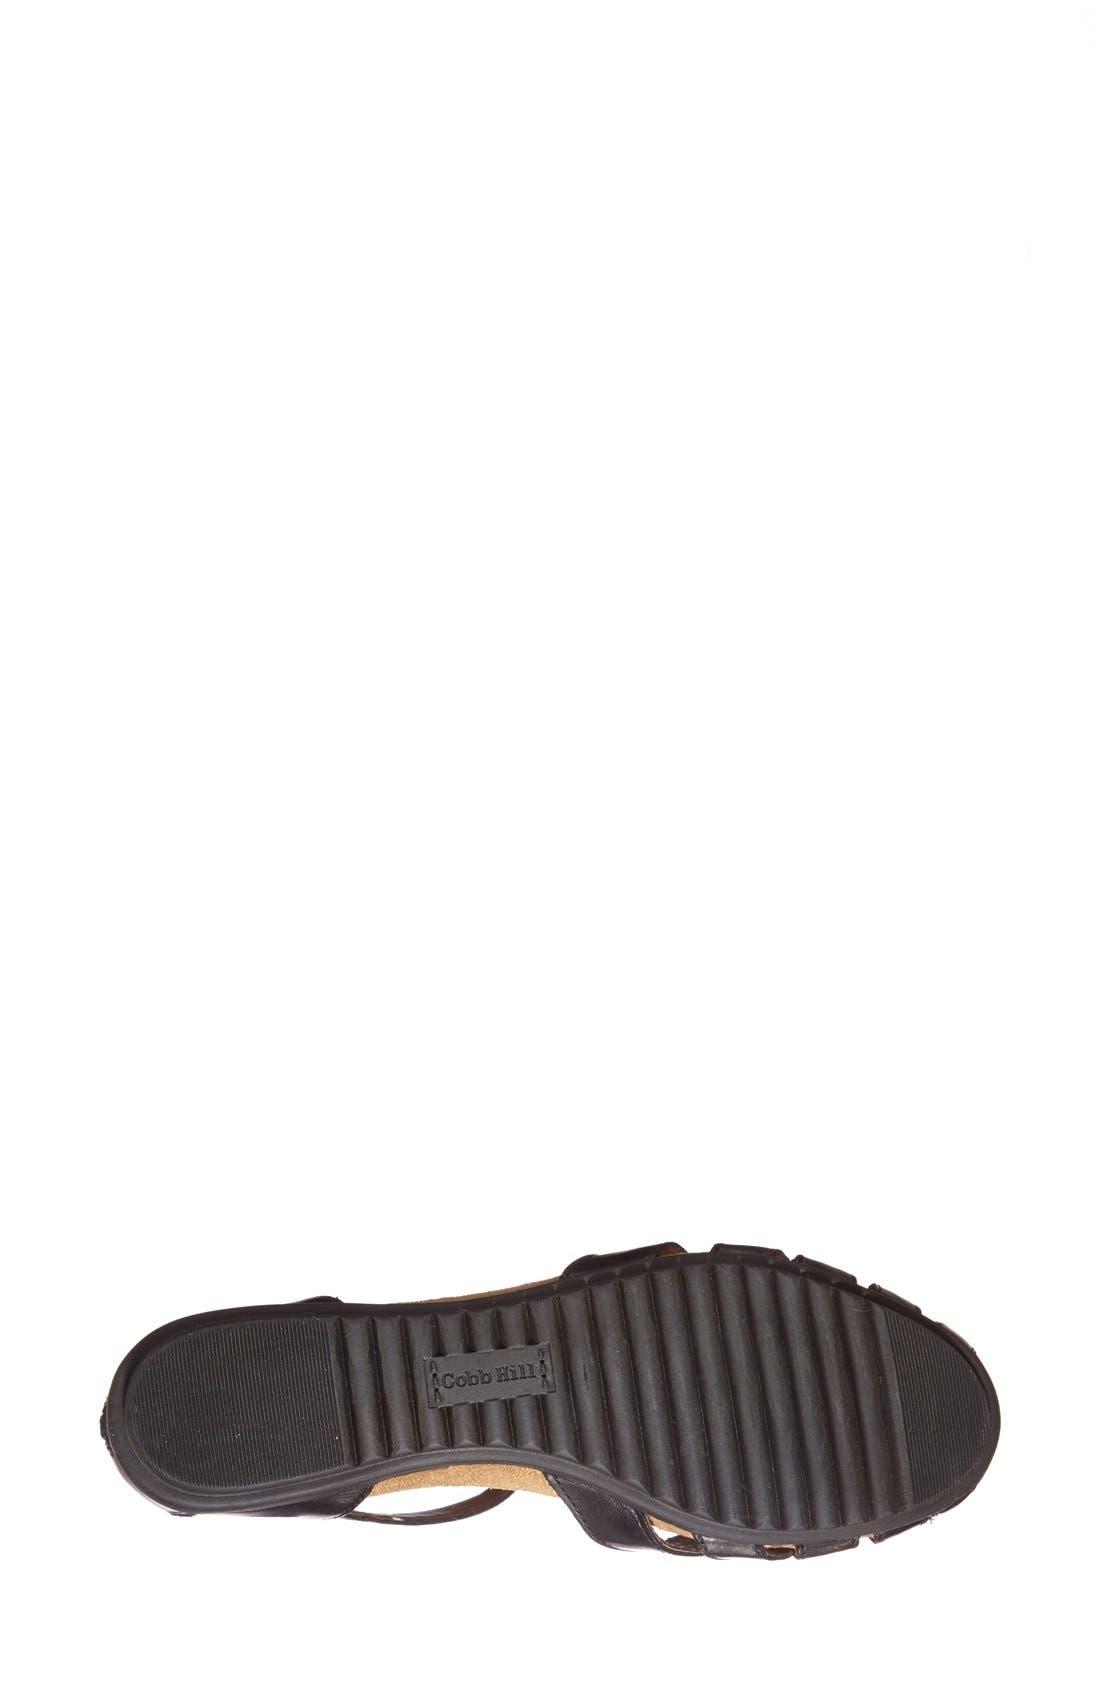 Alternate Image 4  - Rockport Cobb Hill 'Ireland' Leather Sandal (Women)